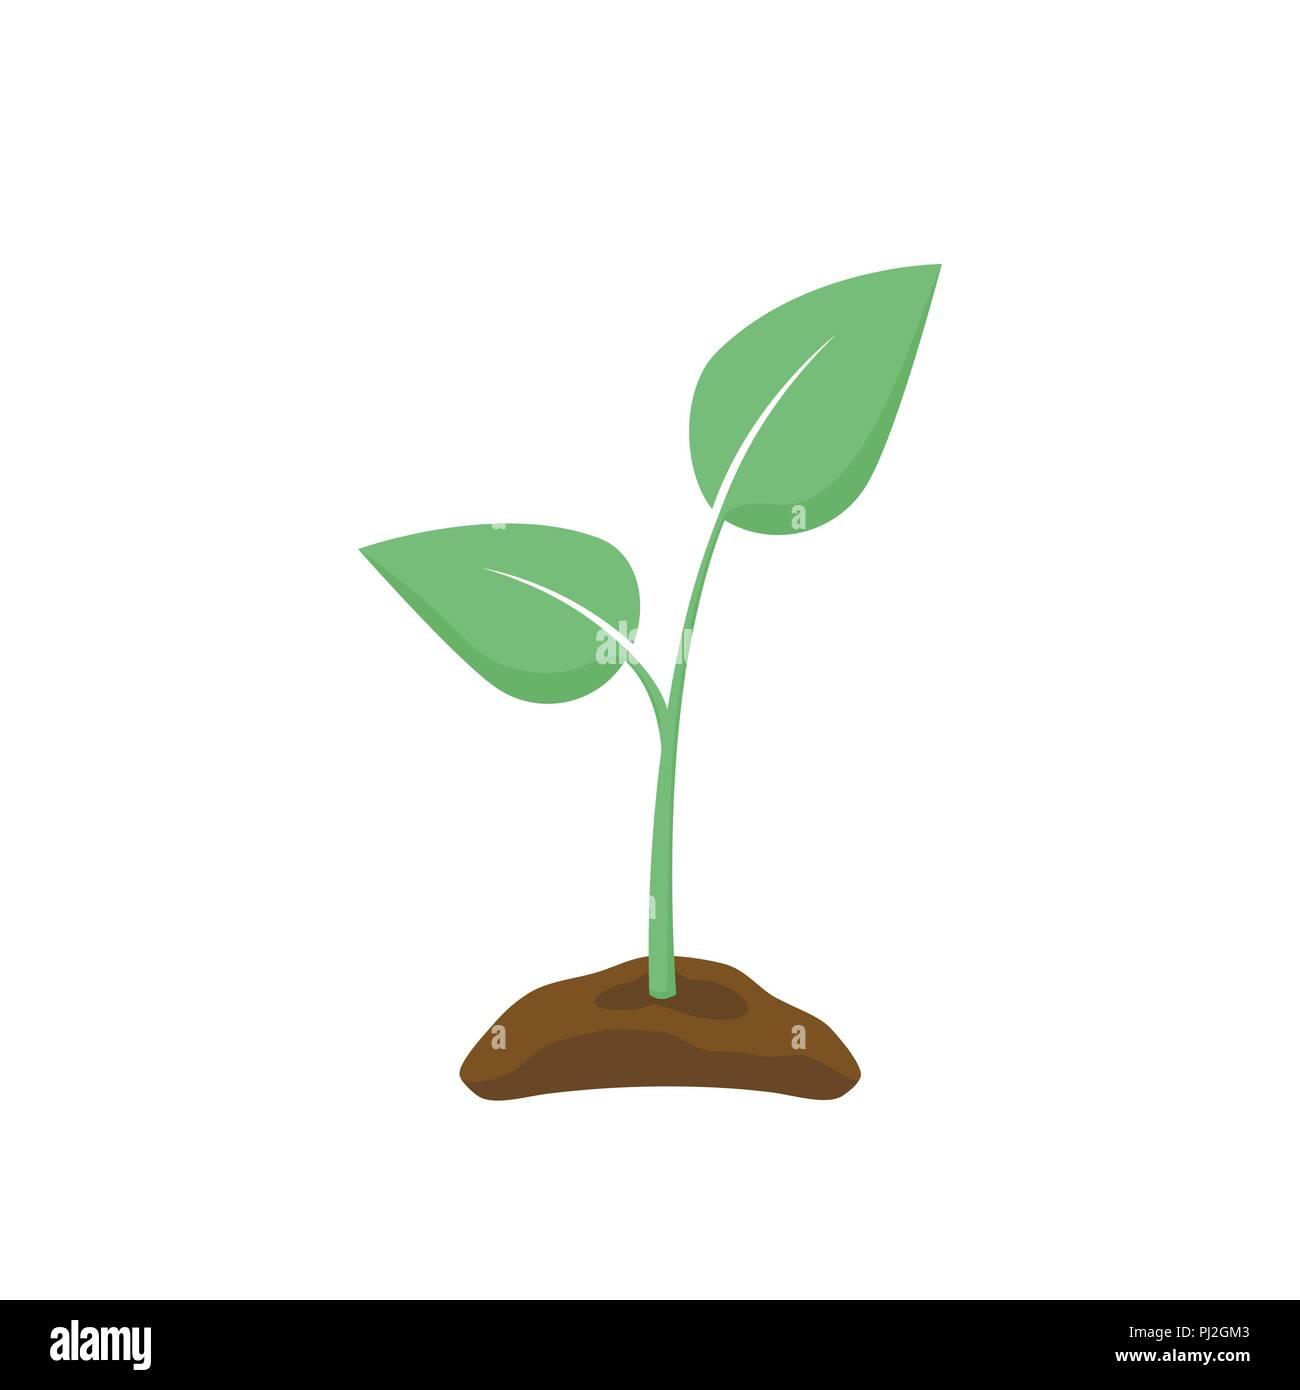 Green Seedling silhouette. Plant nurturing. Vector illustration - Stock Vector